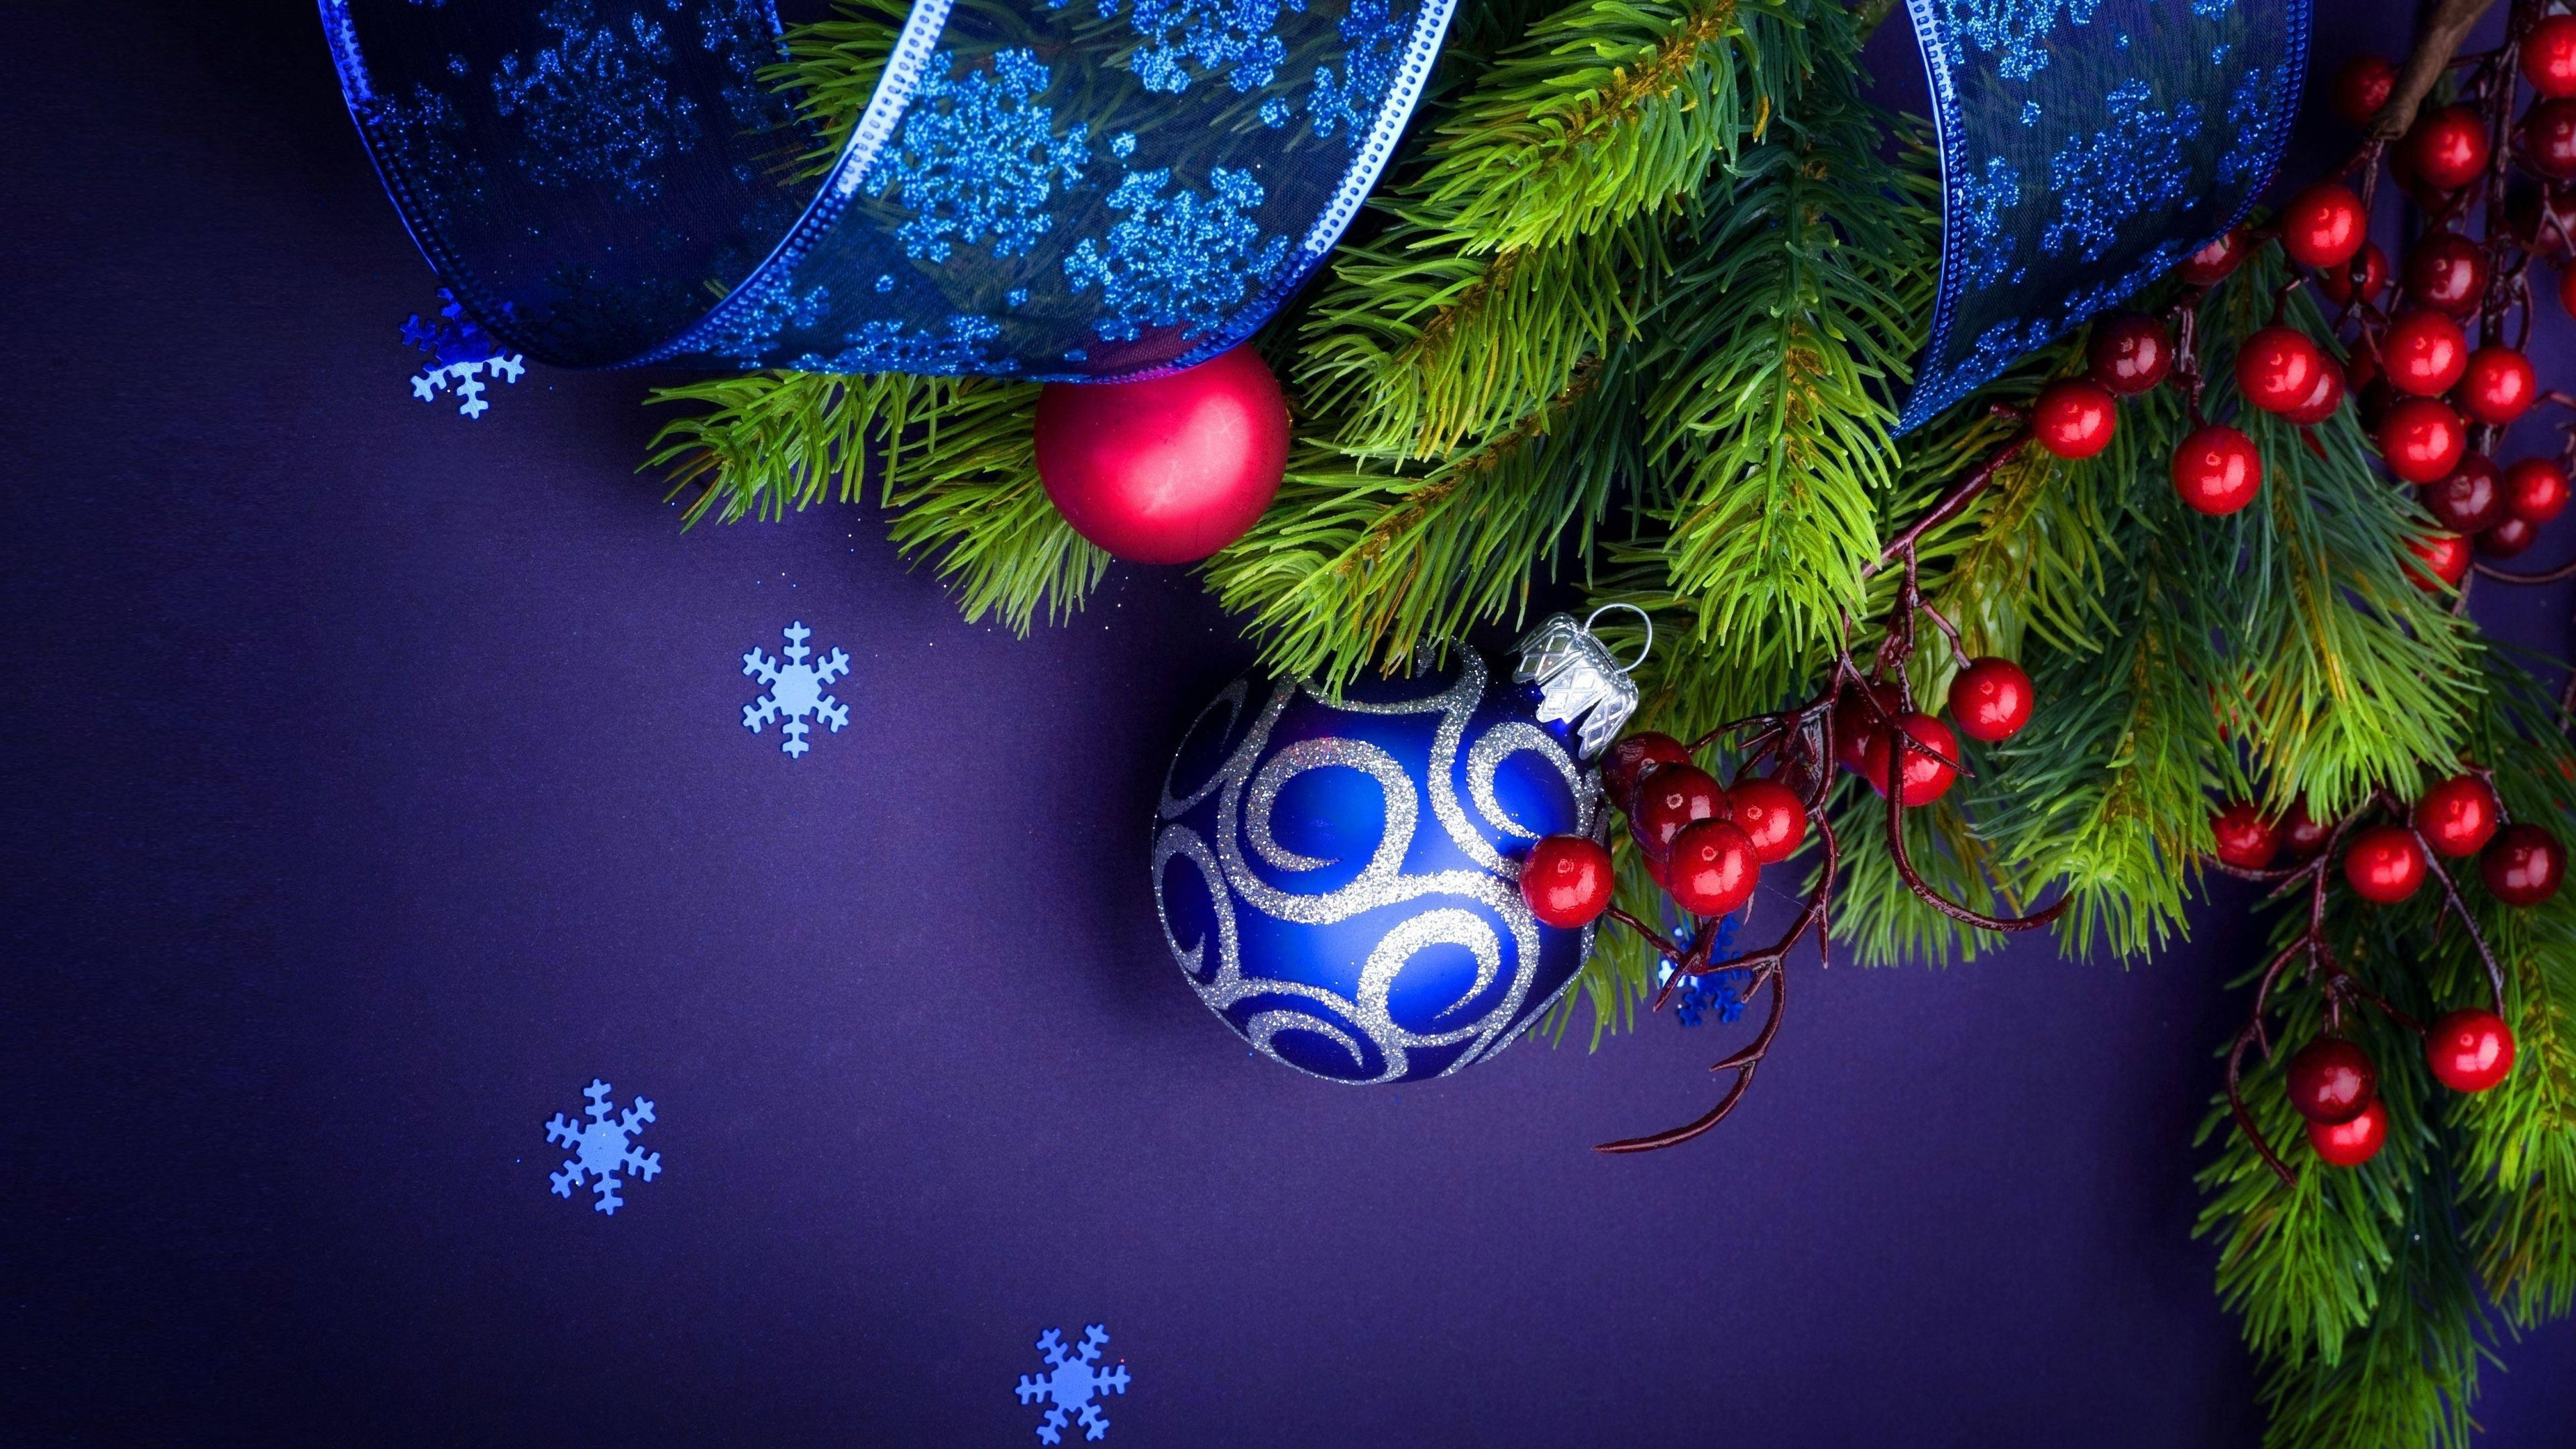 4k Christmas Ornaments Holidays Wallpapers Hd Wallpapers Christmas Wallpapers Celebrat Christmas Wallpaper Christmas Tree Wallpaper Christmas Live Wallpaper